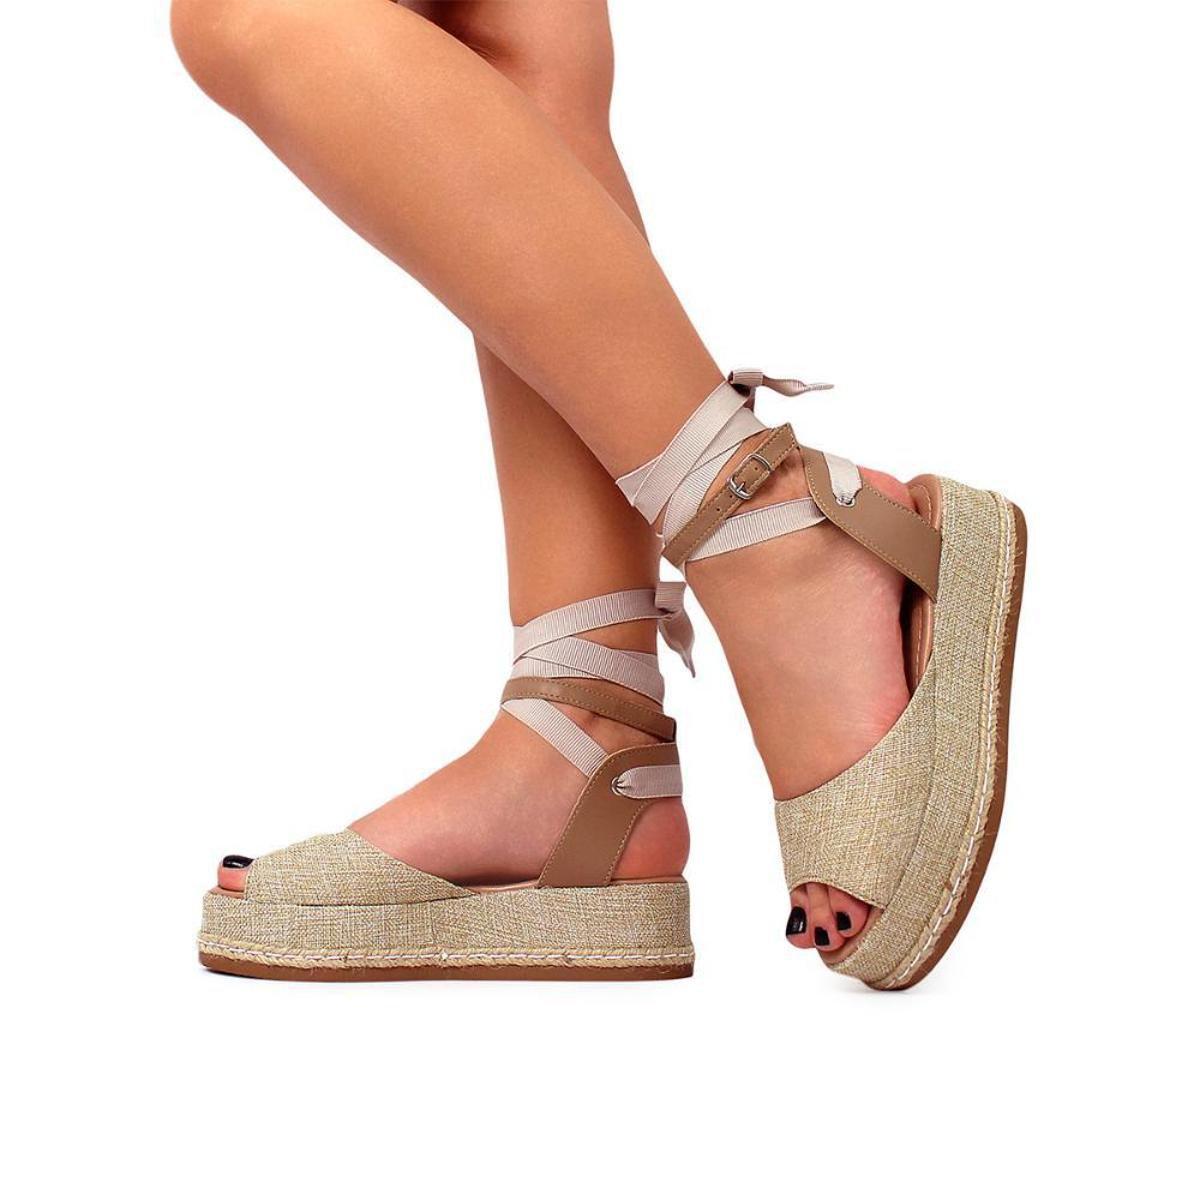 Sandália Damannu Shoes Juta Hannah Feminina - Bege